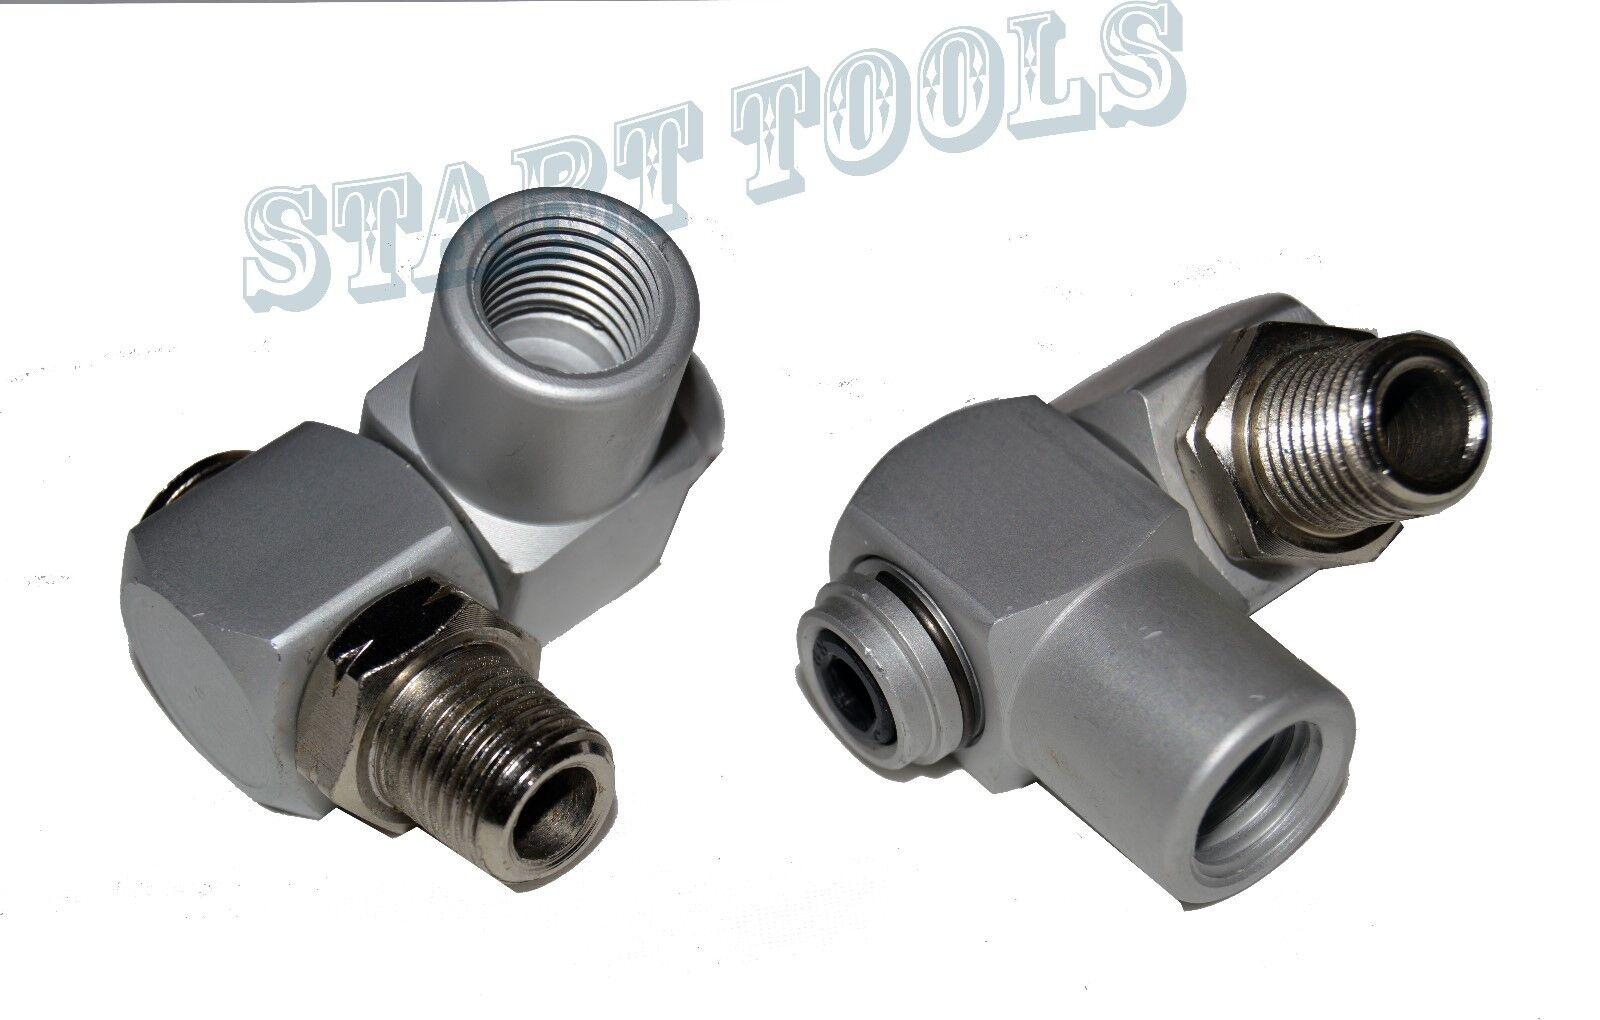 (2) Industrial Aluminum Air Swivel Fitting Connectors Hose Tool Coupler 1 4  NPT